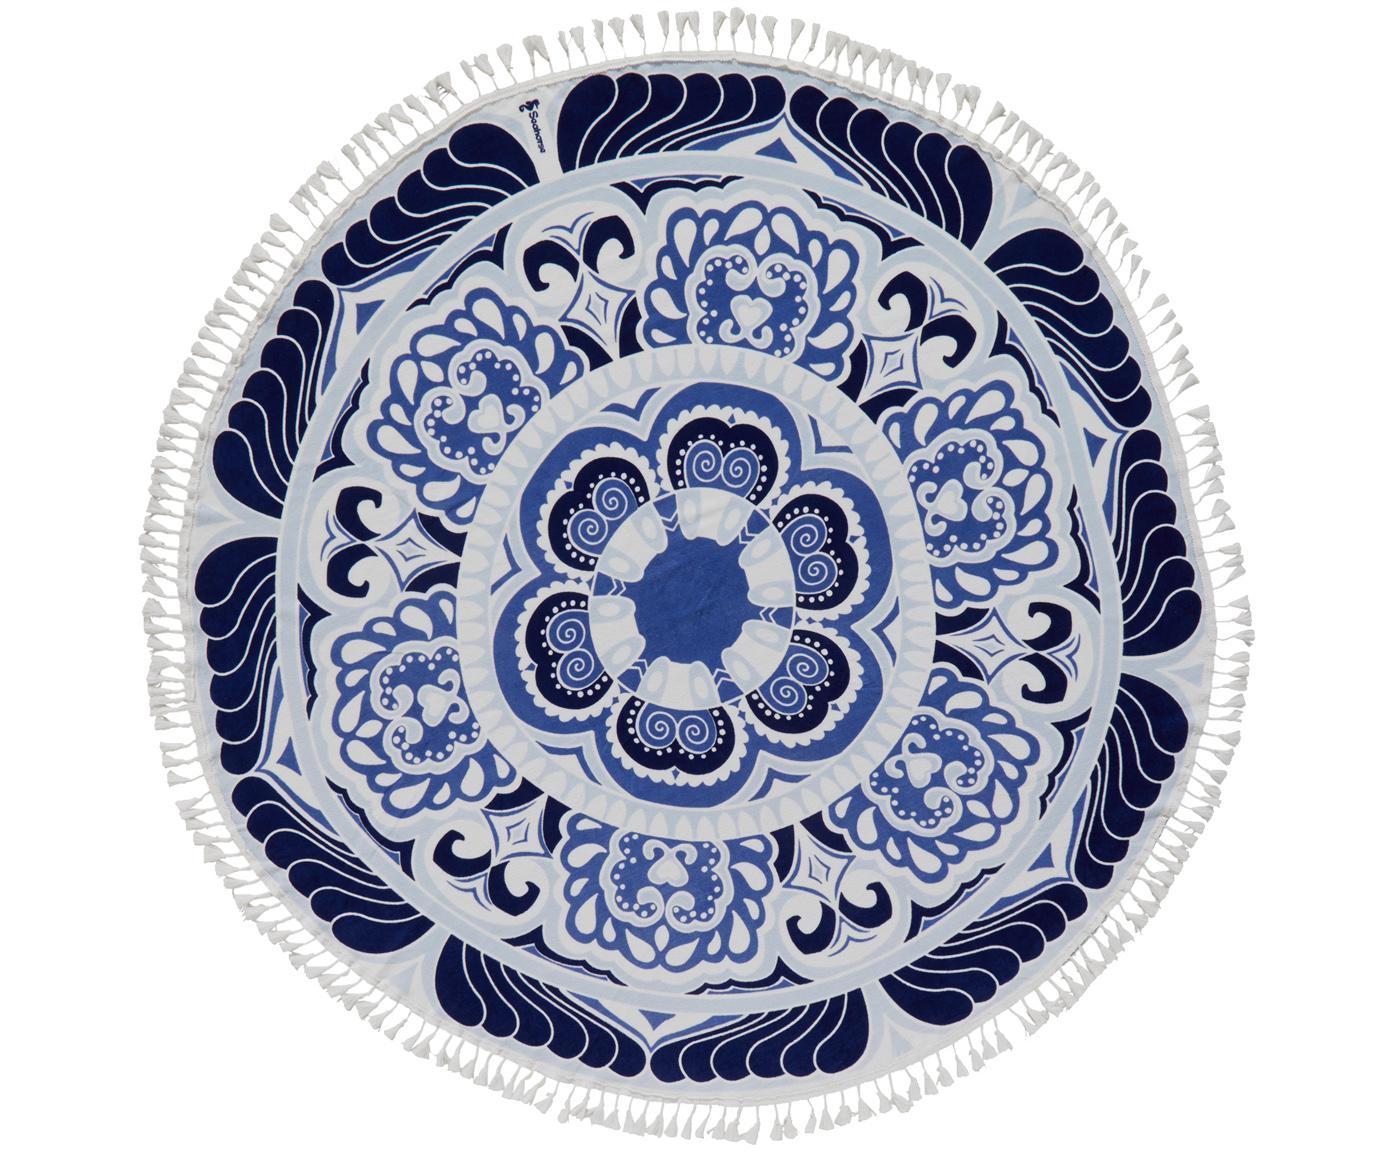 Telo mare Carouse, Retro: spugna (cotone) Qualità m, Blu, bianco, Ø 150 cm